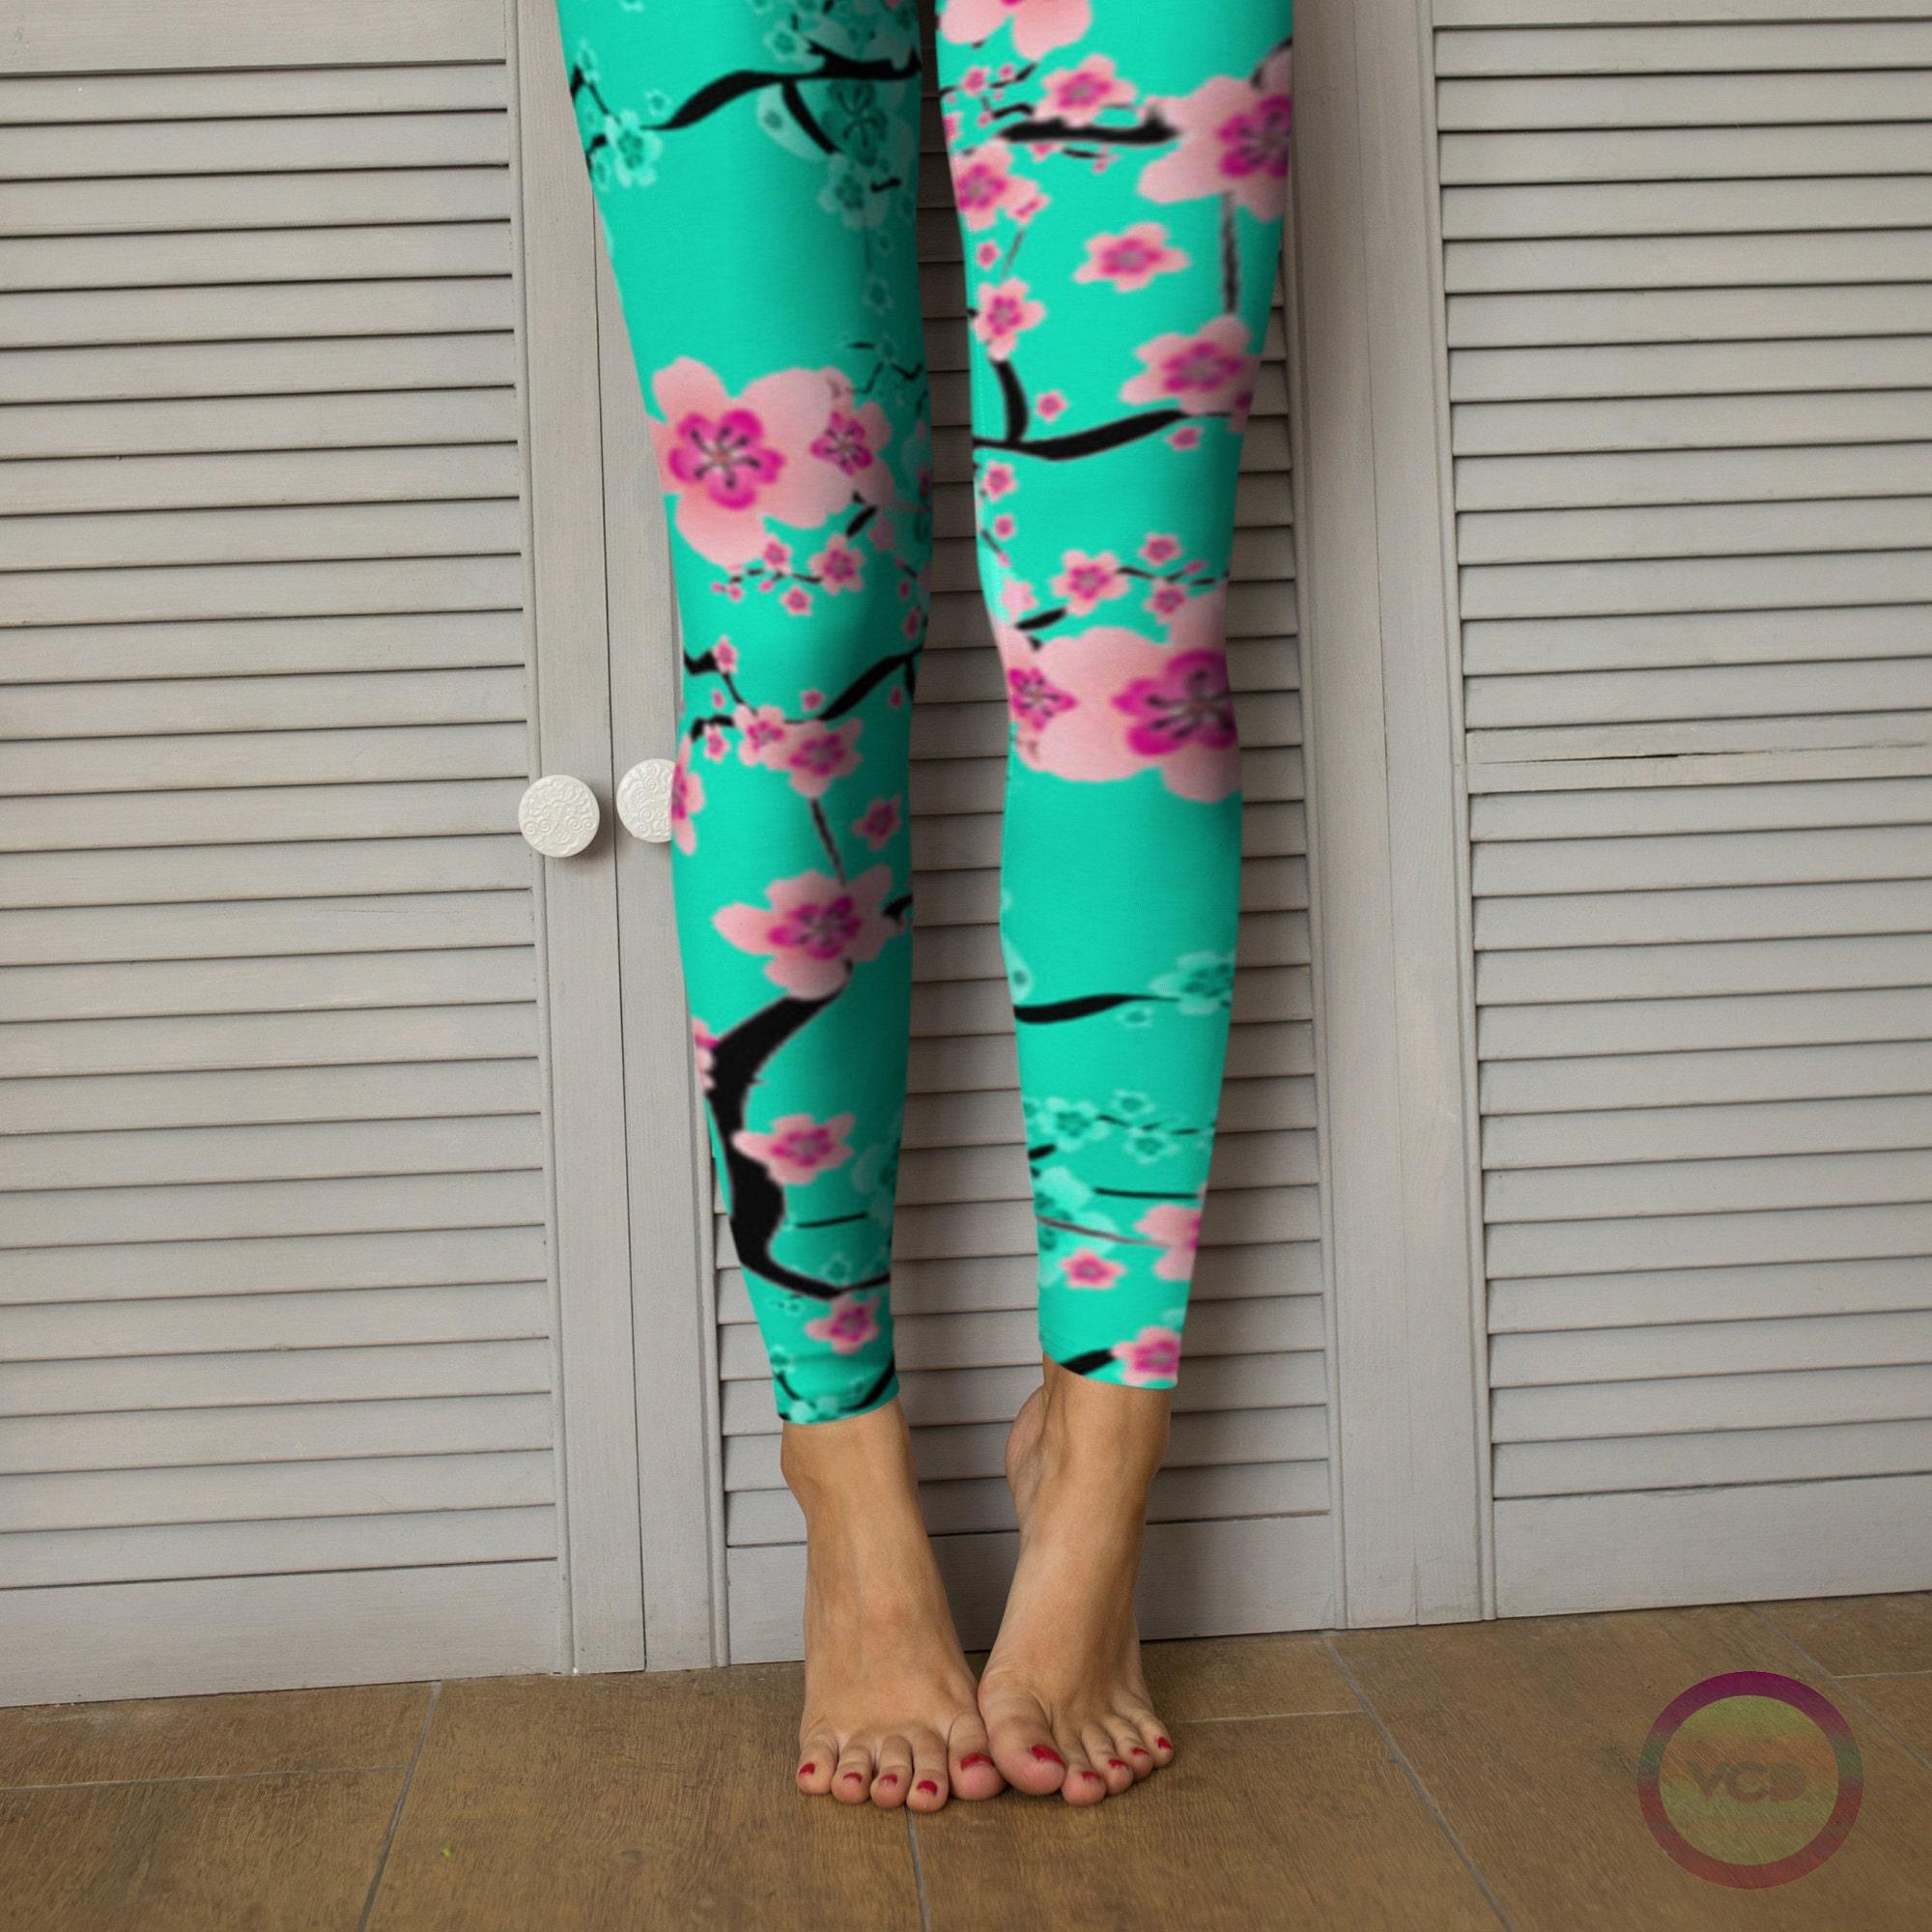 0d5afe44a1ba6 FLORAL SPRING LEGGINGS Cherry Blossom Pattern Teal / Pink Flower Printed  Leggings for Women Yoga Leggings Womens Yoga Pants Floral Print